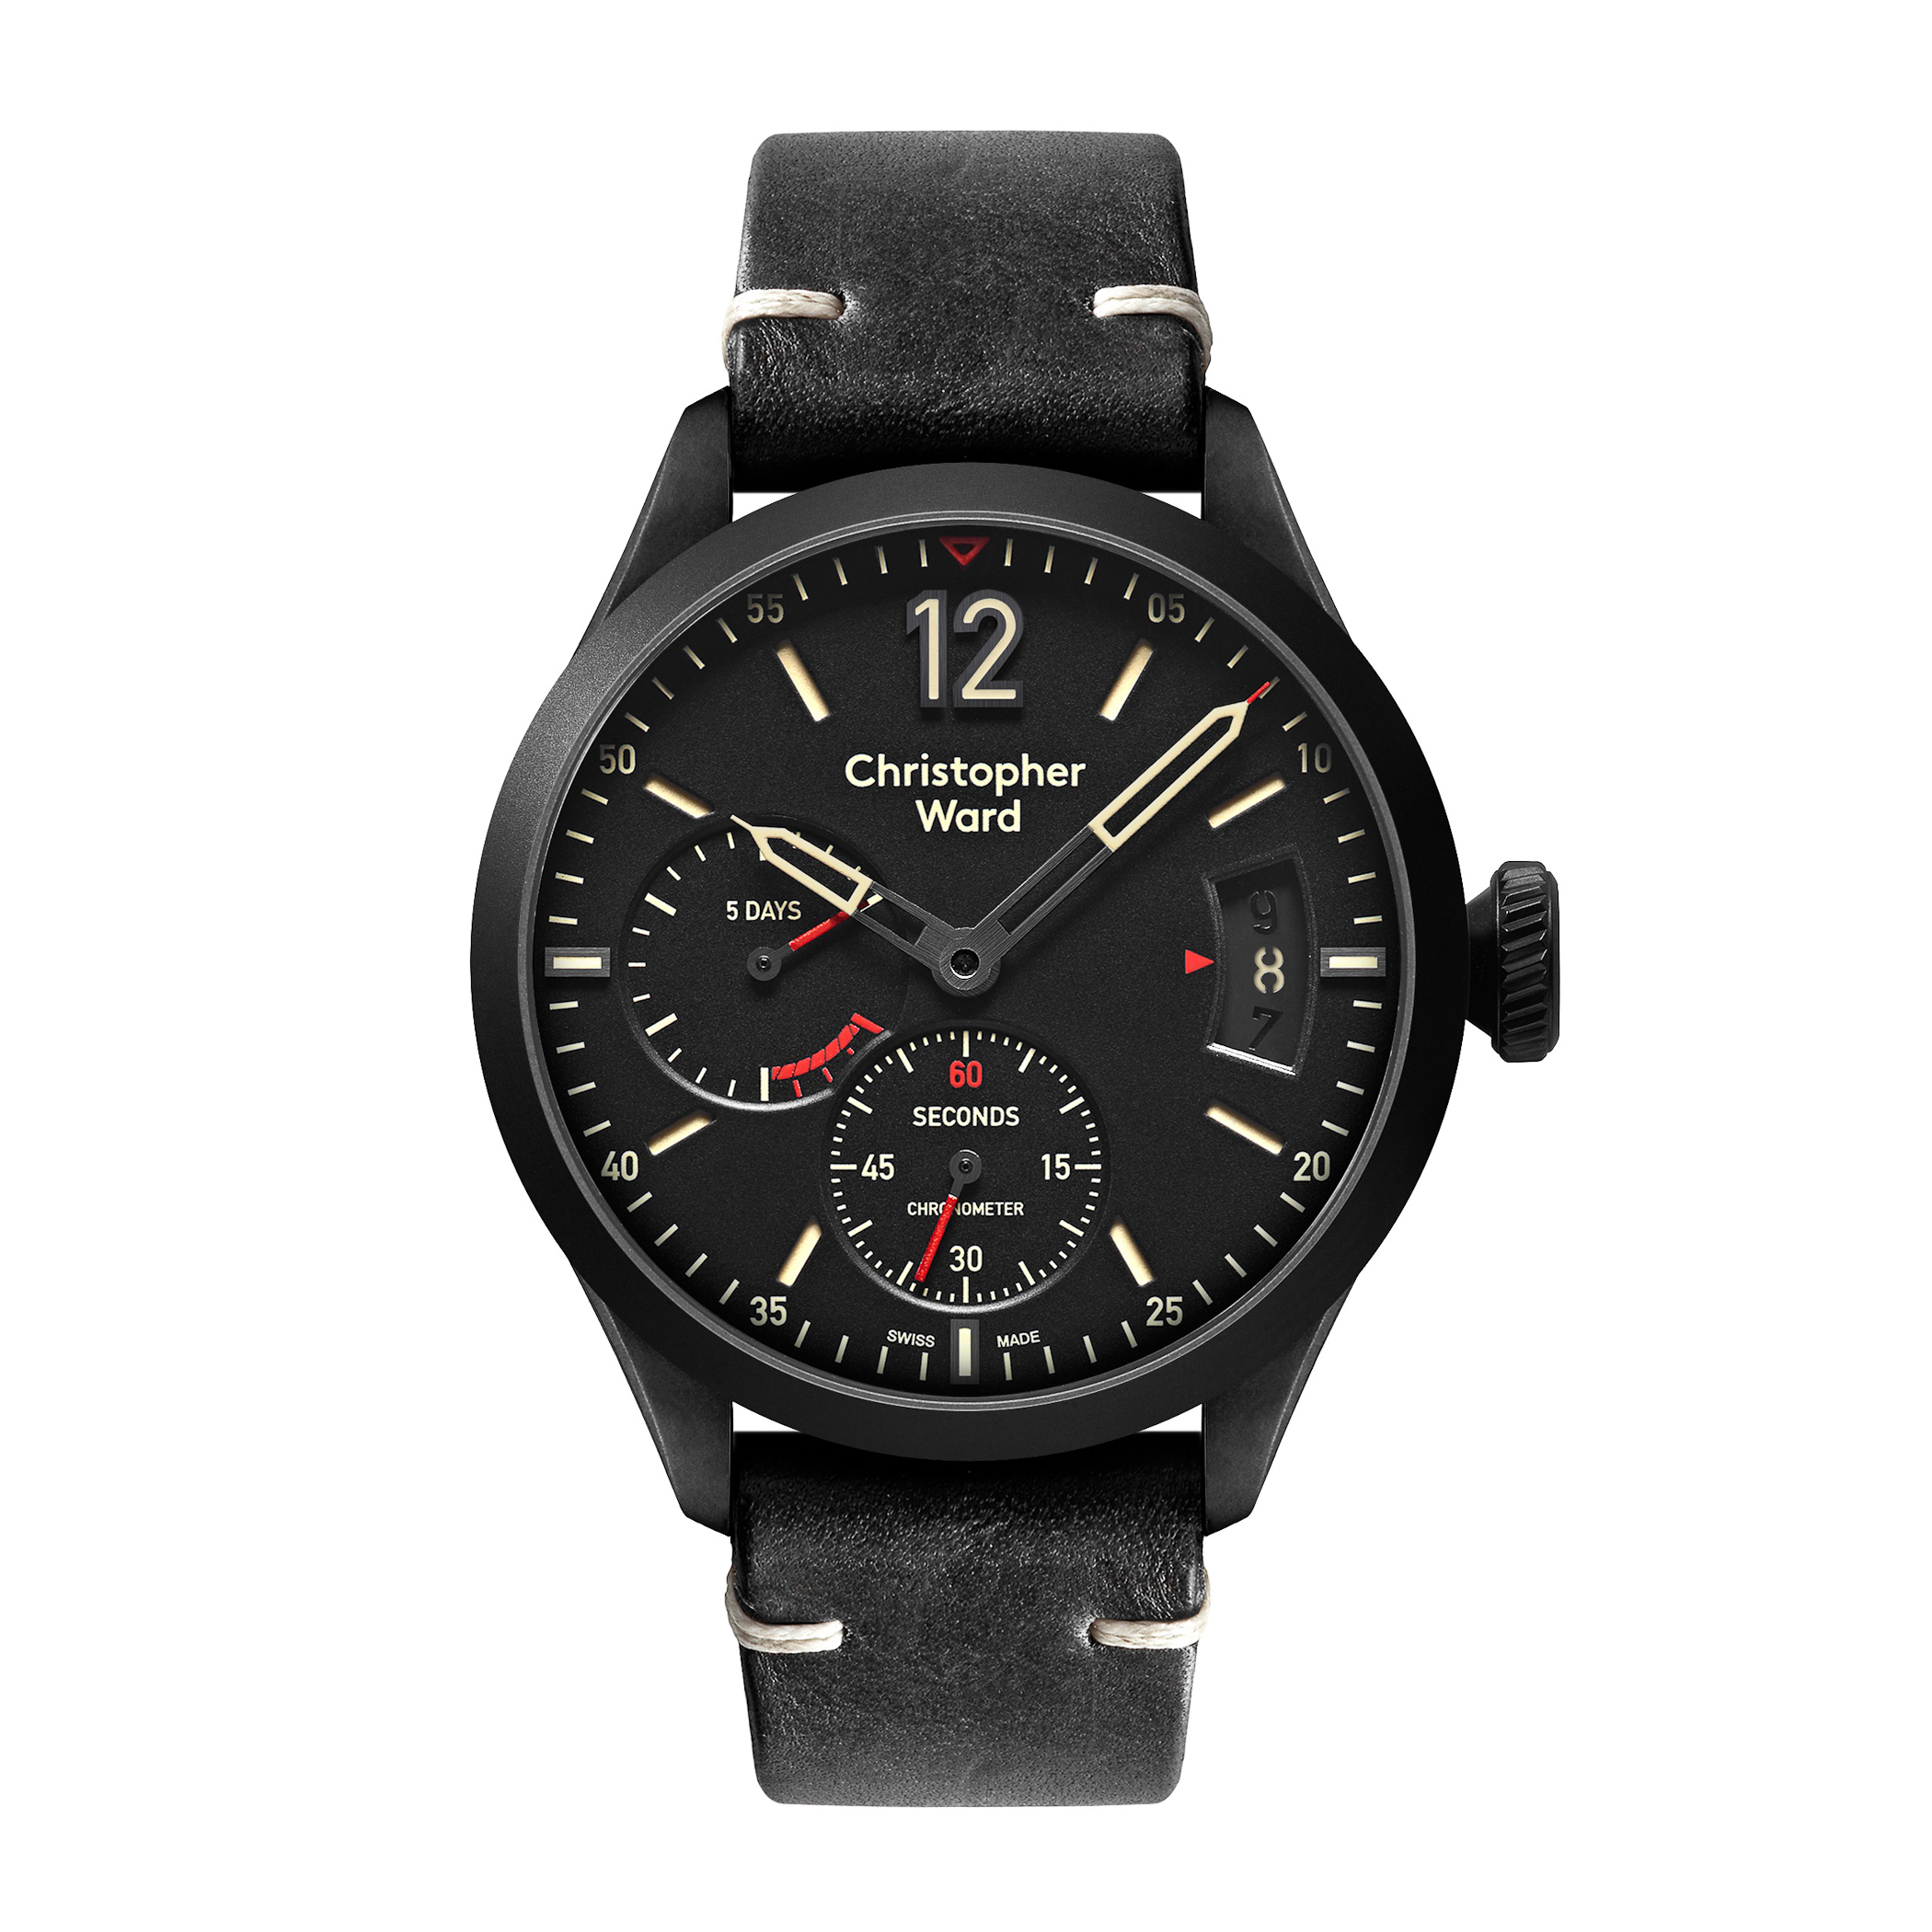 ChristopherWard-C8 Power Reserve Chronometer-2